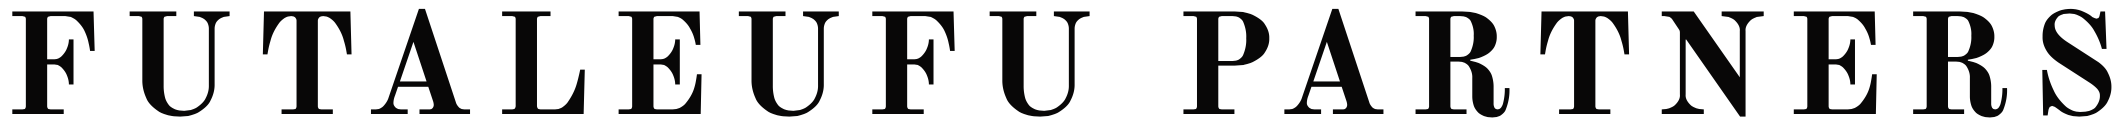 Futaleufu_fund logo.png